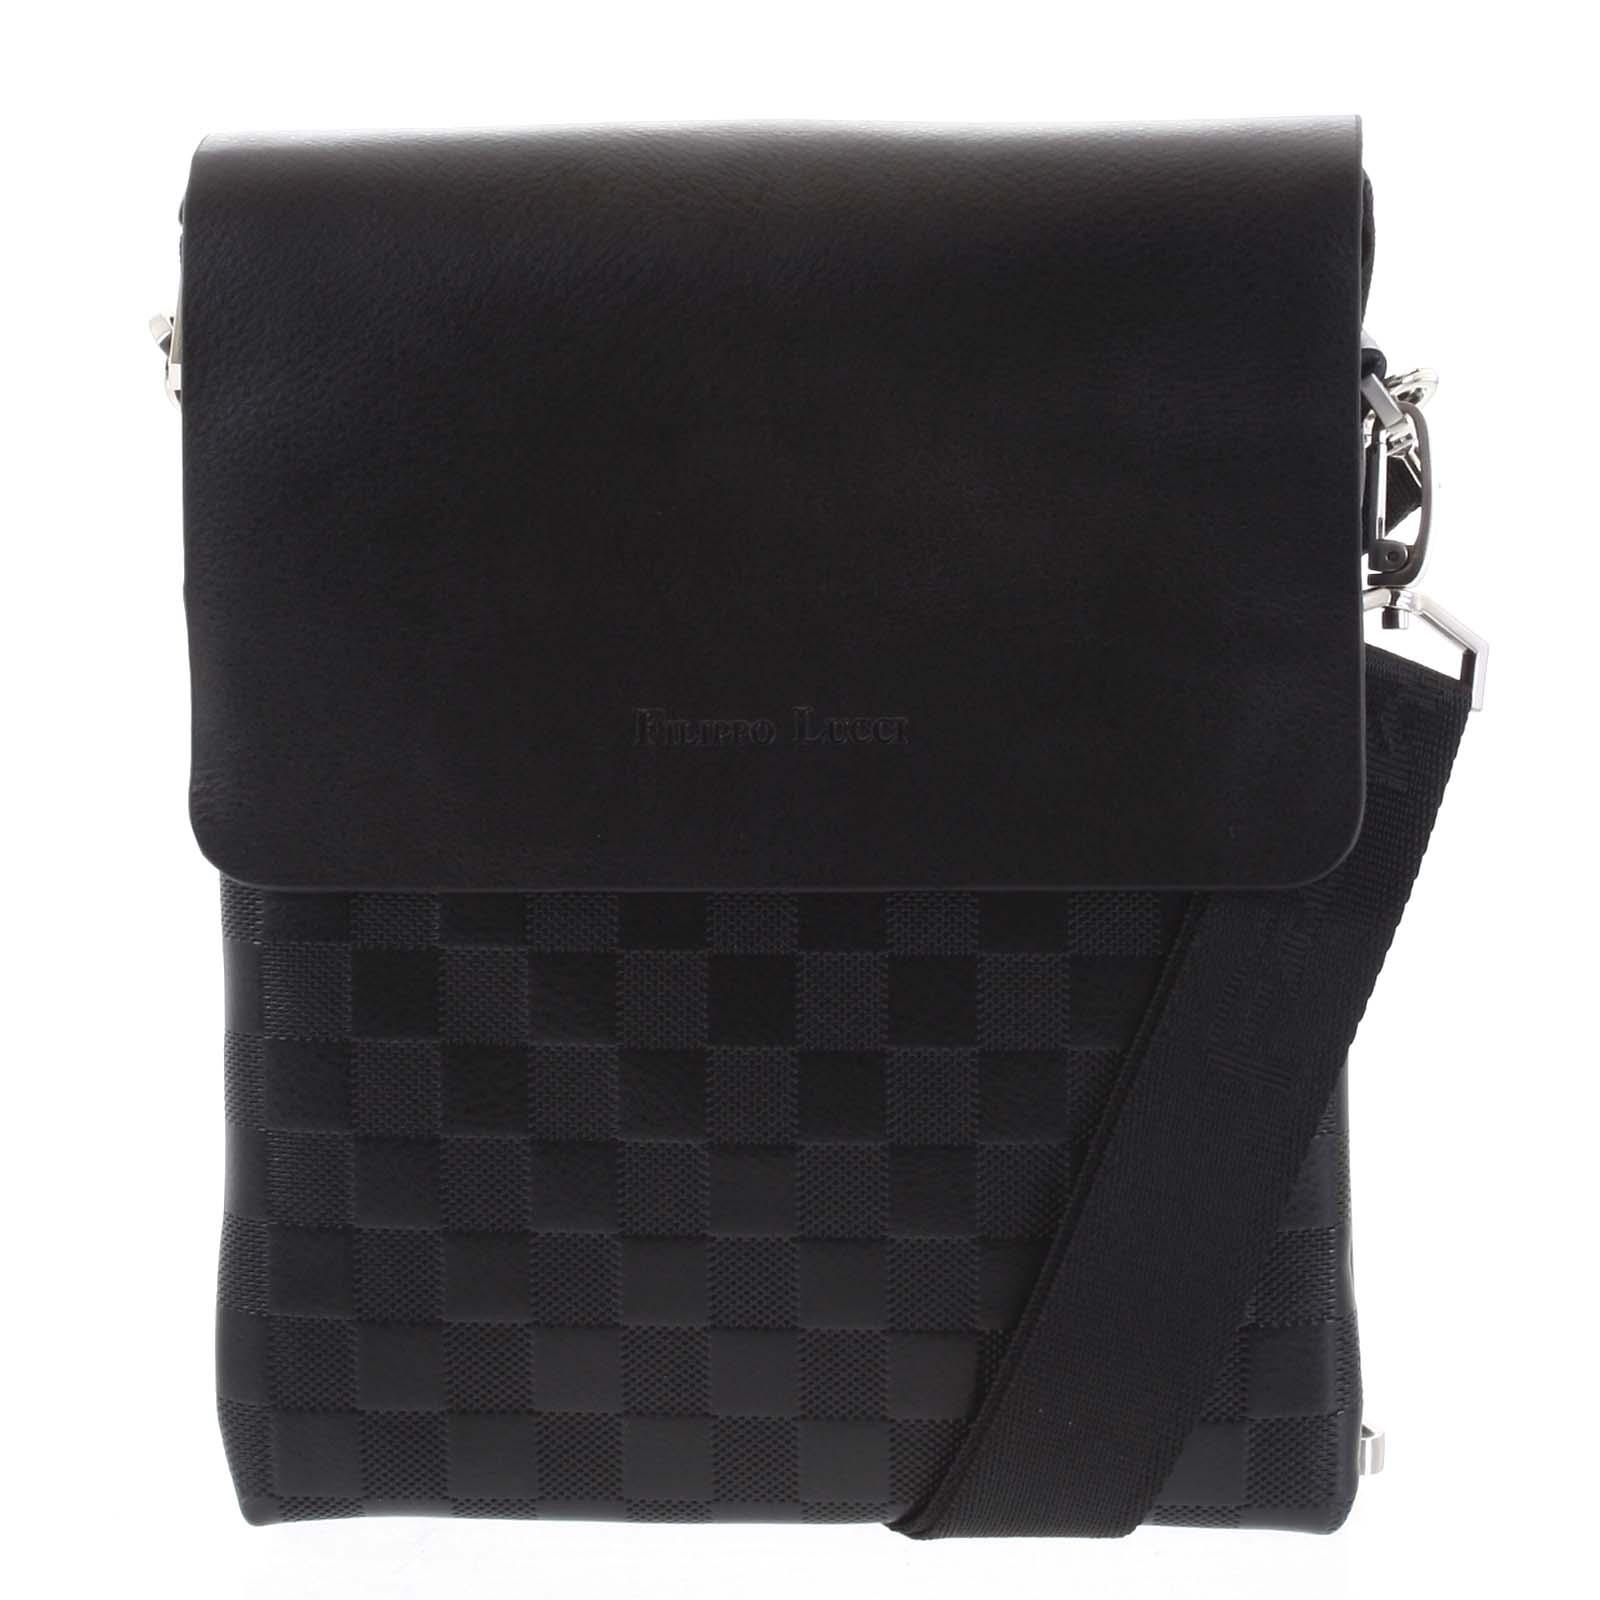 Pánská kožená taška černá - Filippo Lucci Paolo